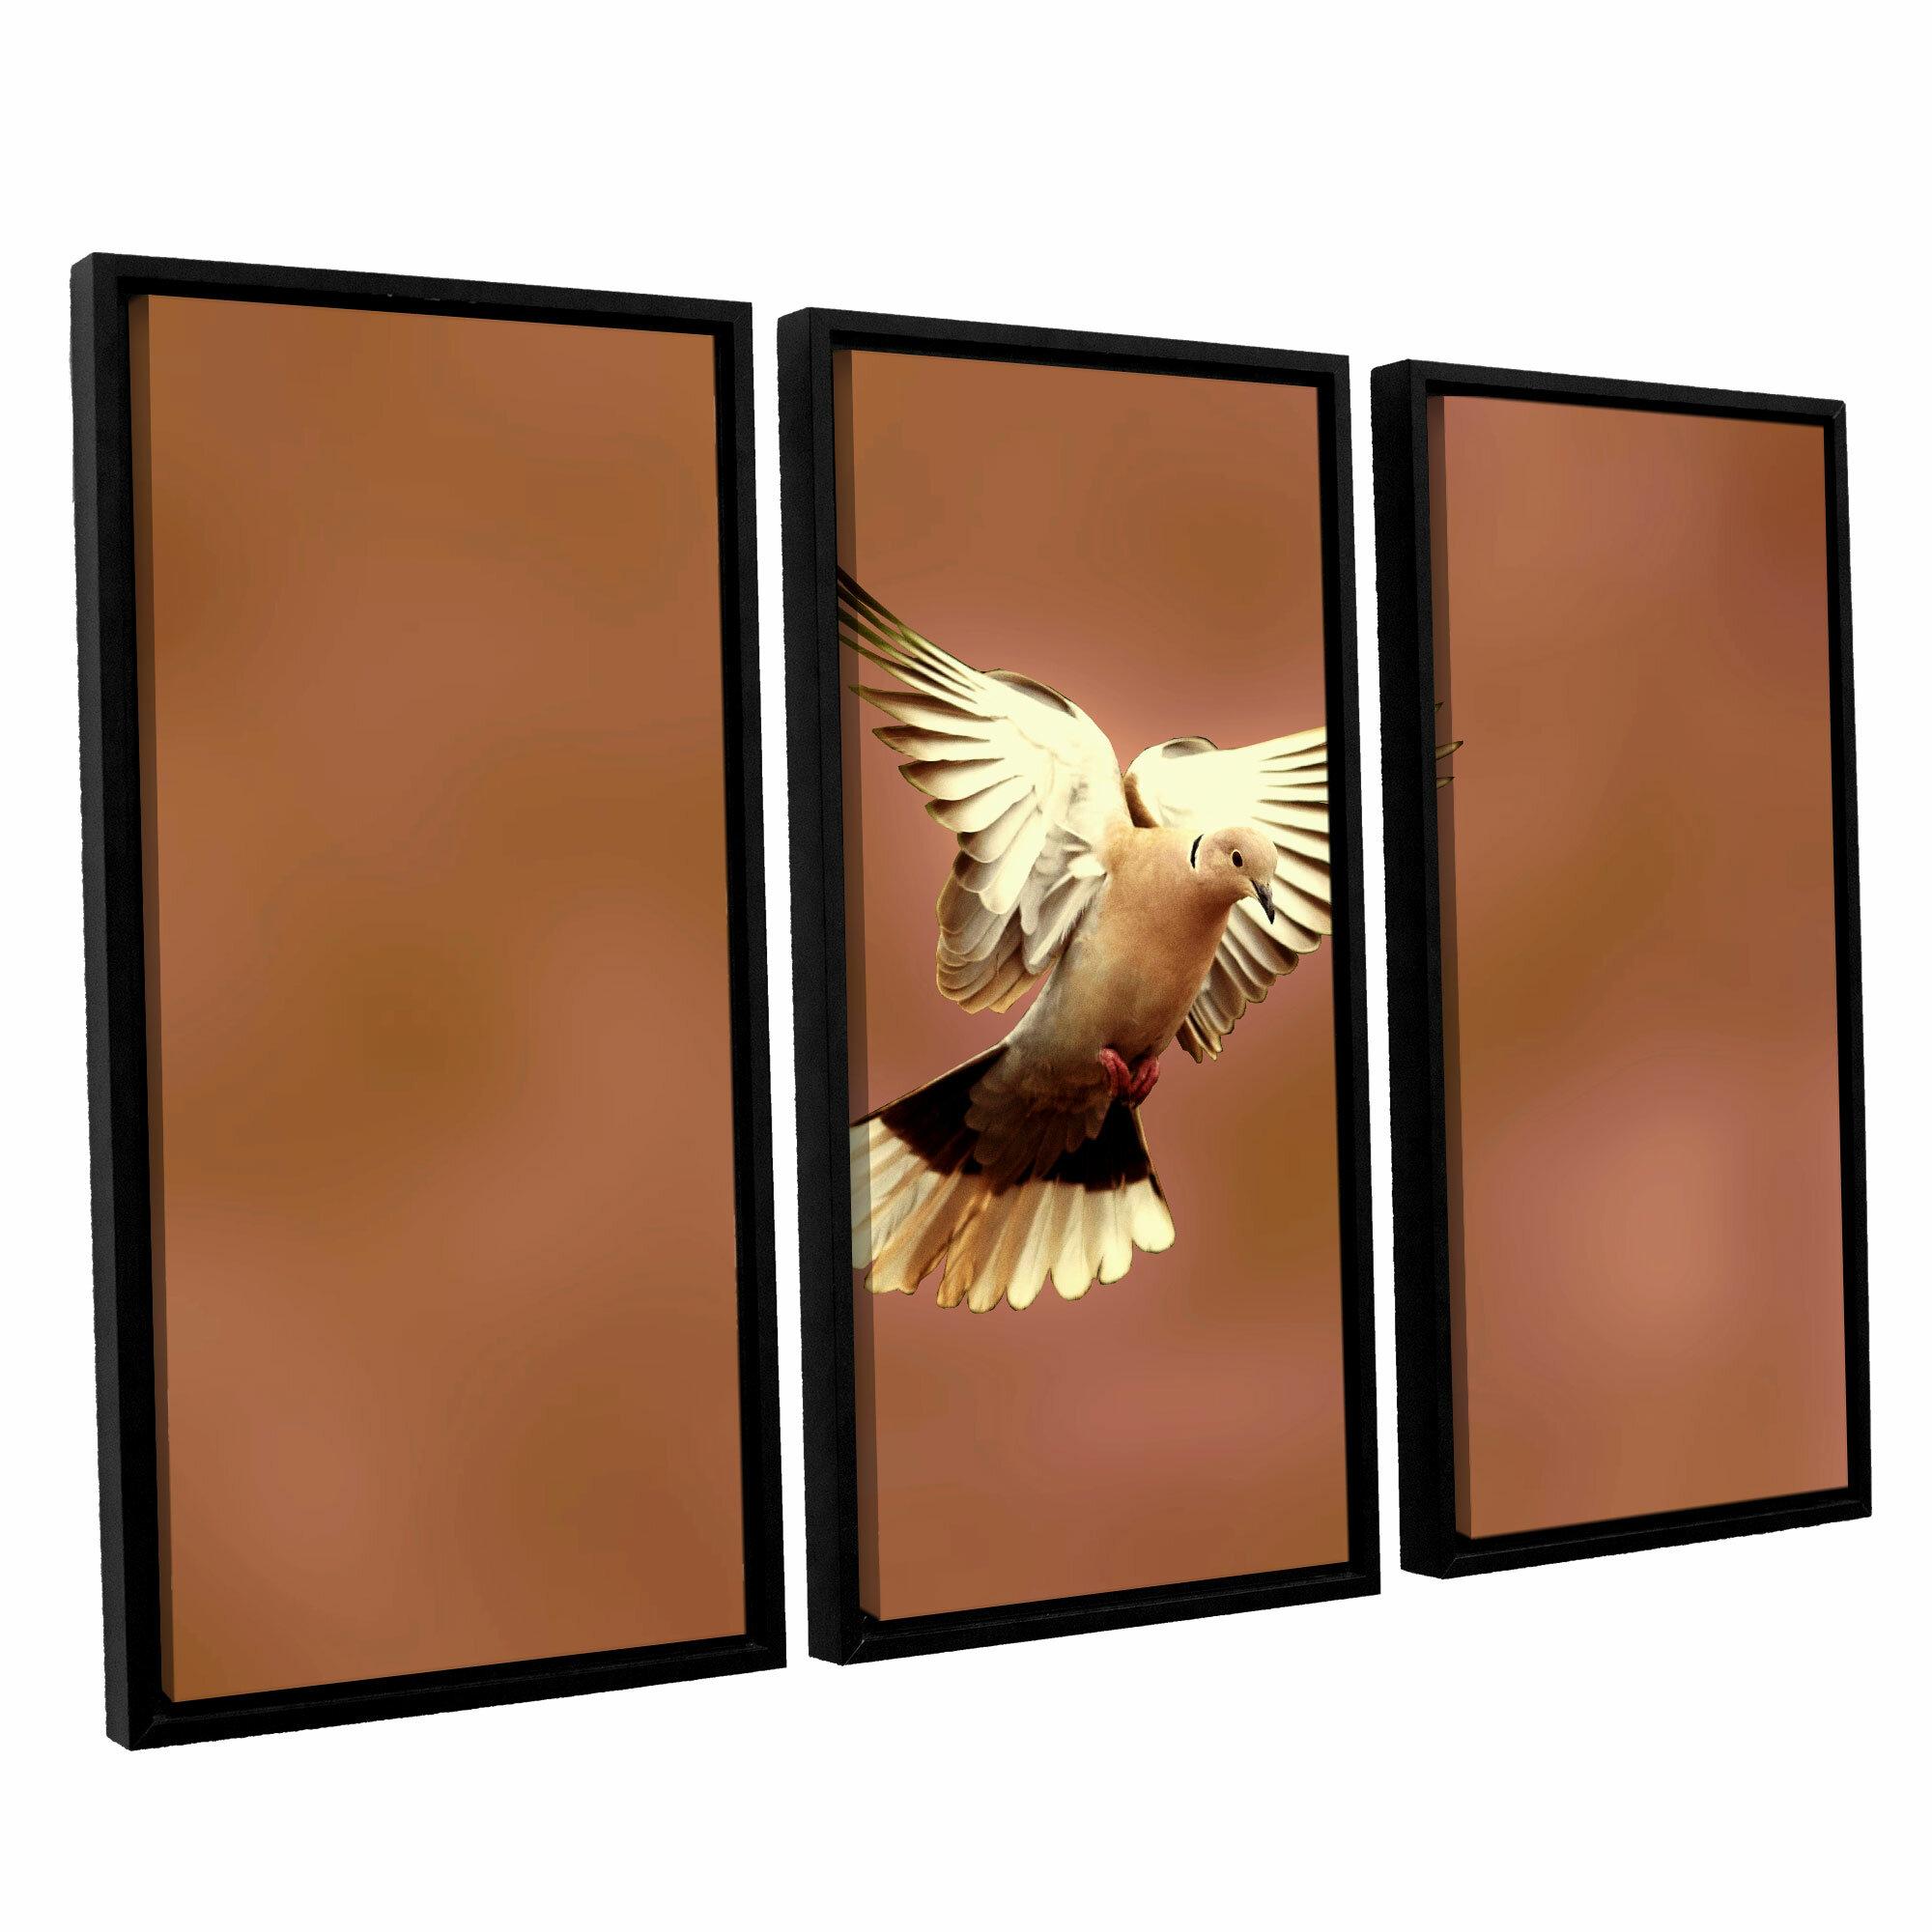 Artwall Pinkdaove1 By Lindsey Janich 3 Piece Framed Photographic Print On Canvas Set Wayfair